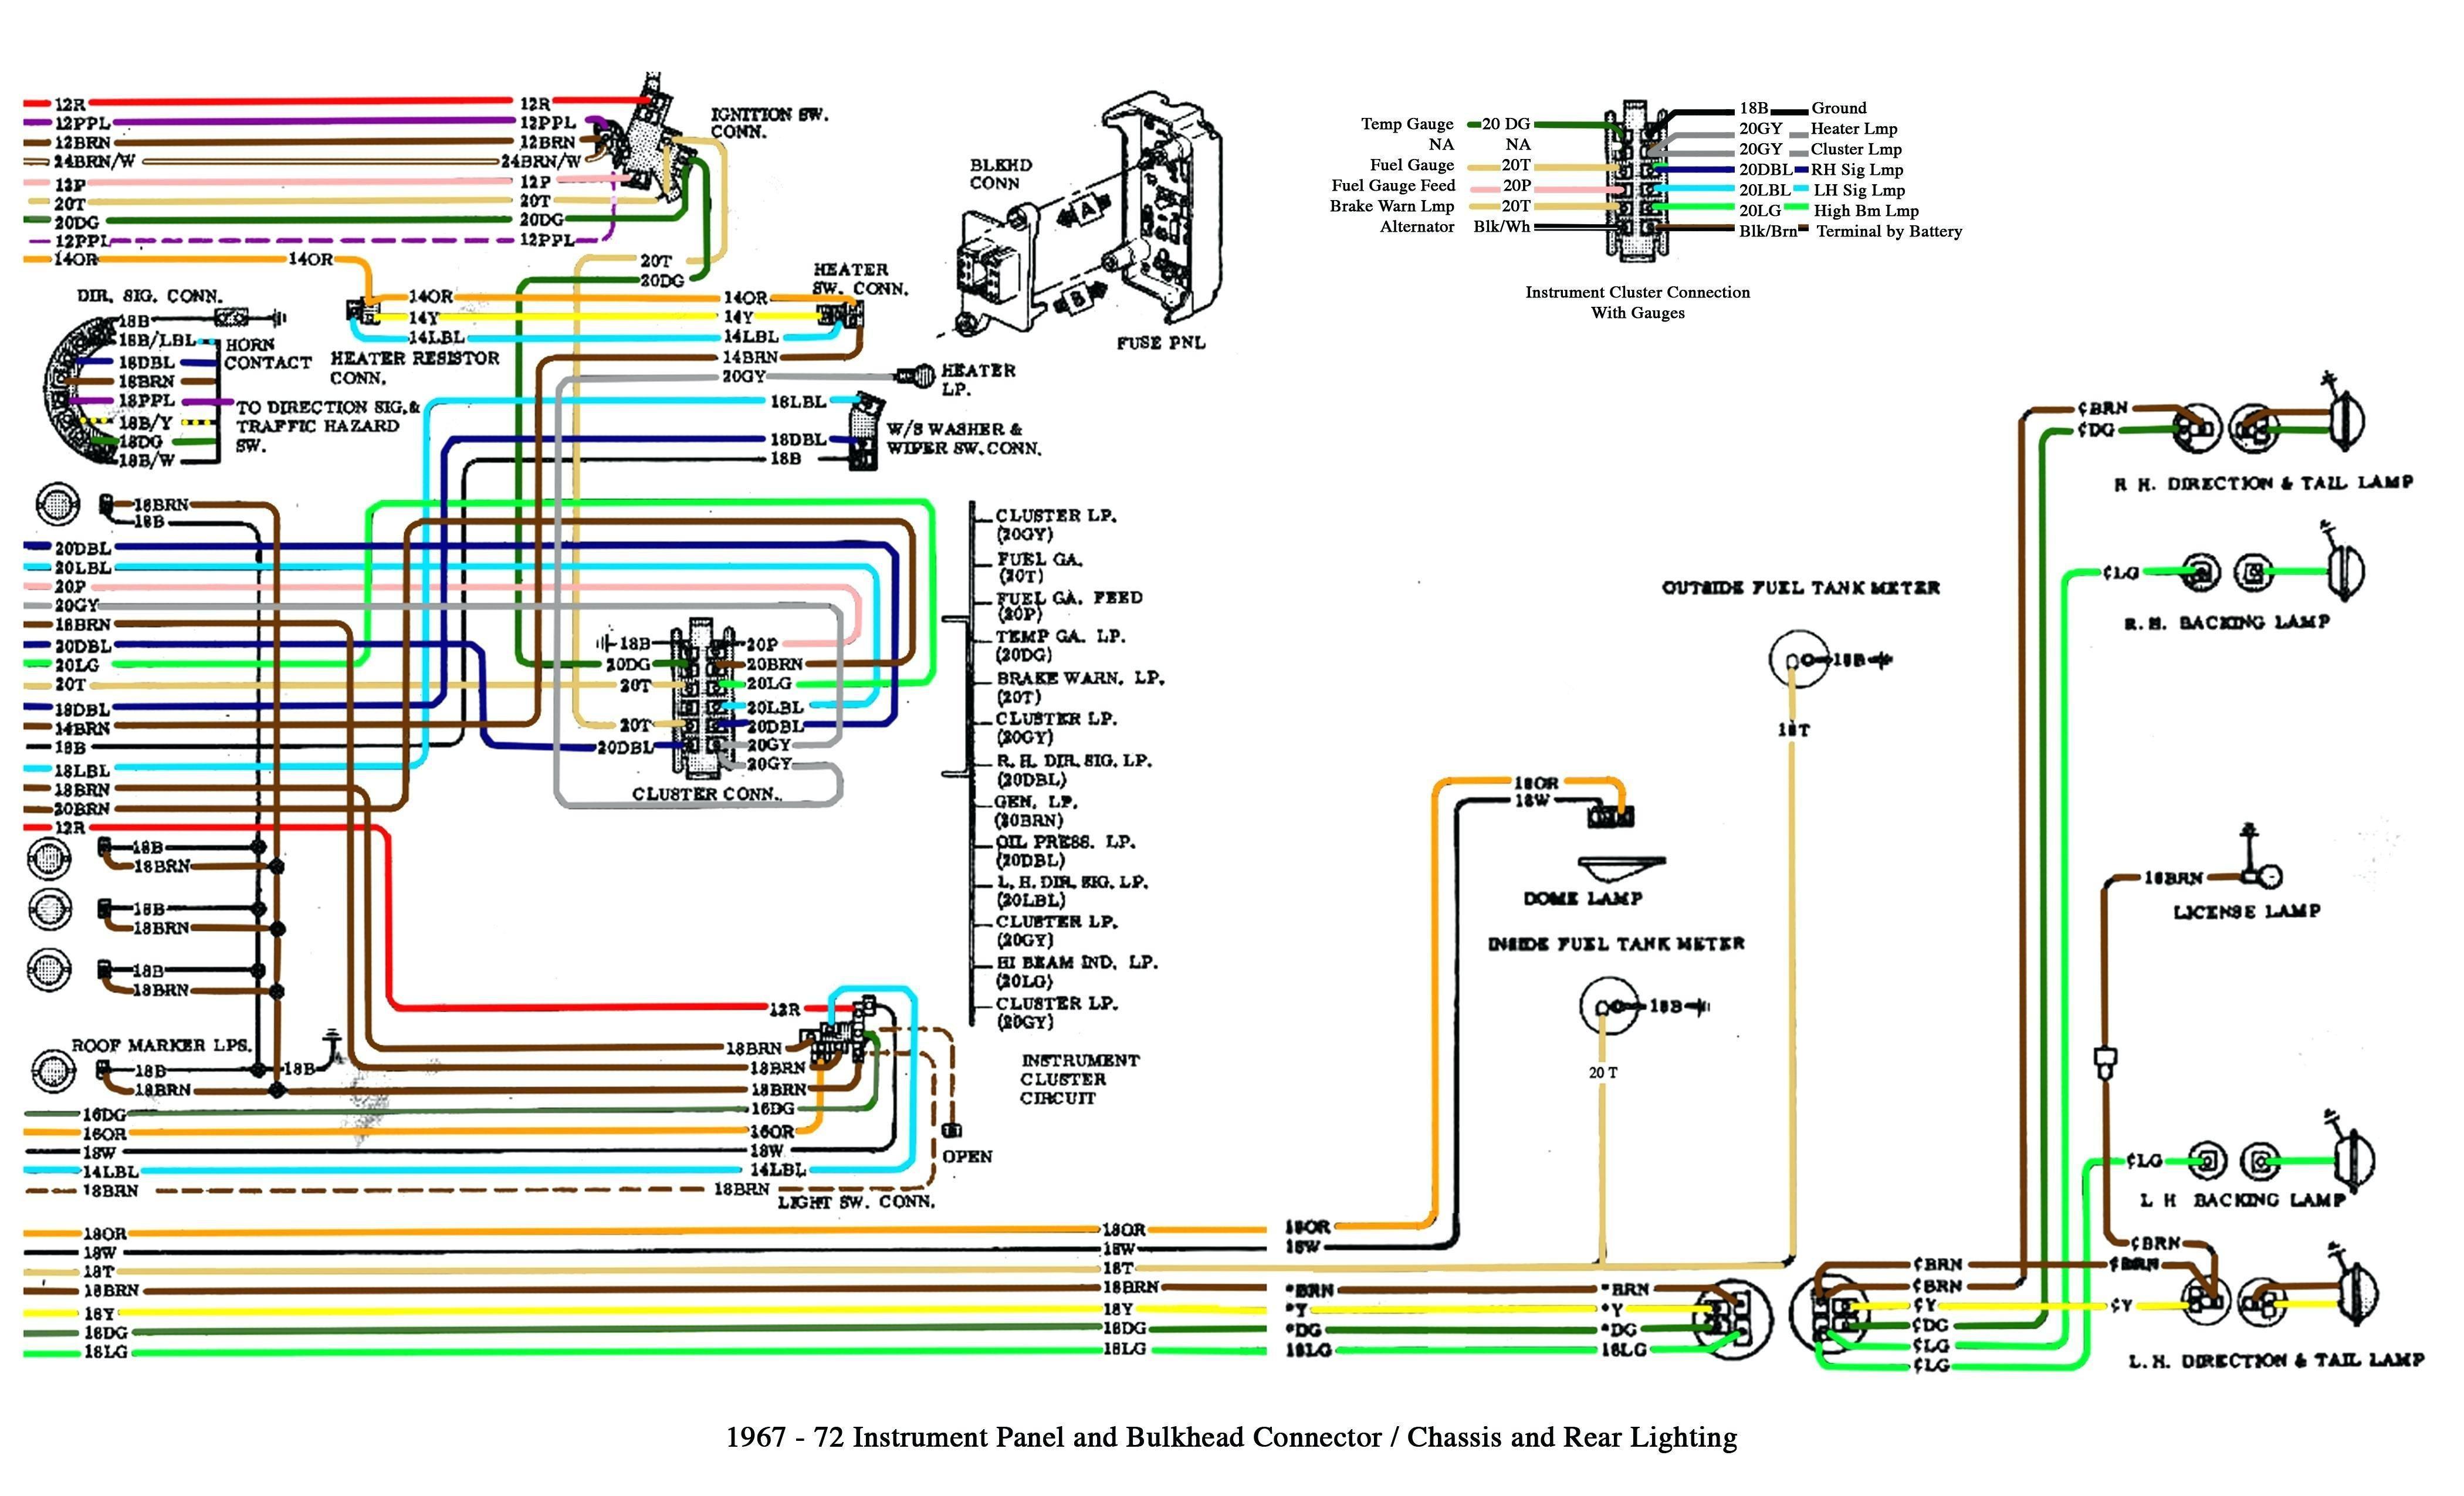 79 Chevy Truck Wiring Diagram 2004 Chevy Silverado Radio Wiring Diagram New 2002 Chevy Impala Of 79 Chevy Truck Wiring Diagram